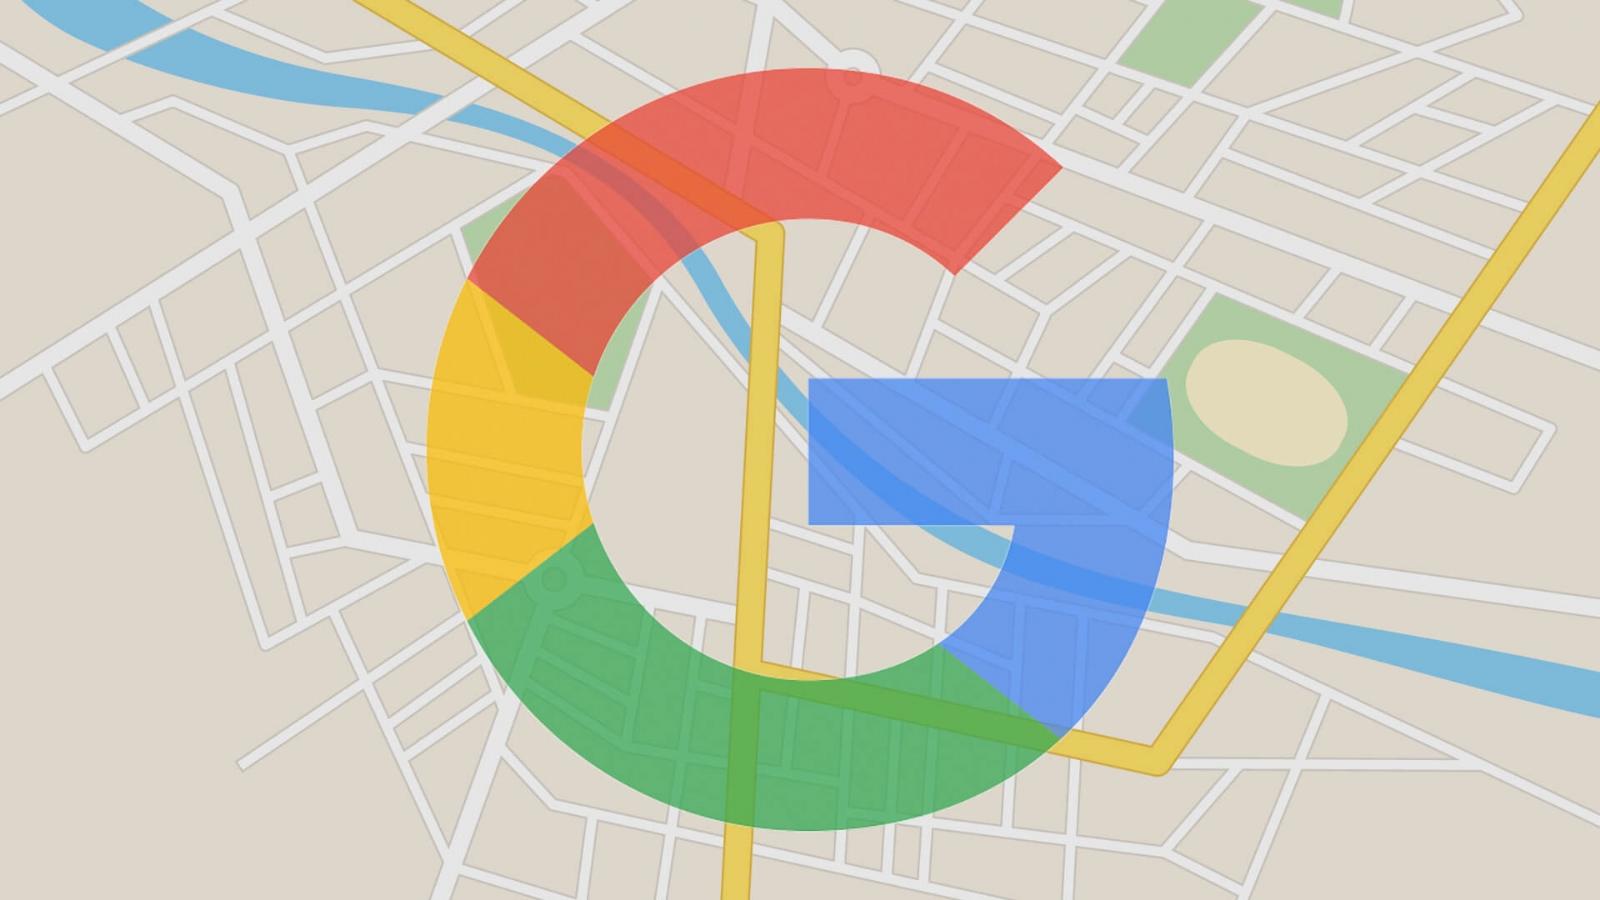 Descubrió a su novia siéndole infiel gracias a Google Maps